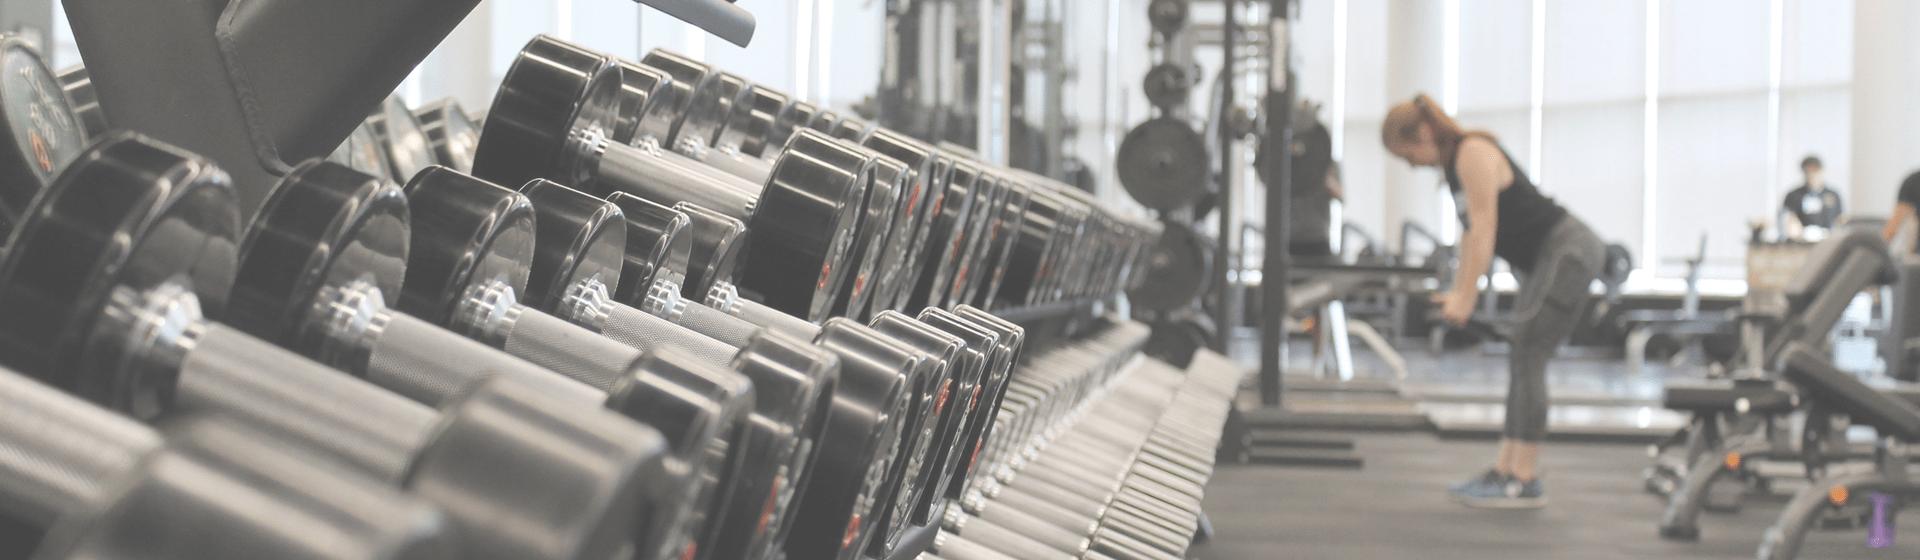 Fitnessstudiovertrag vorzeitig kündigen